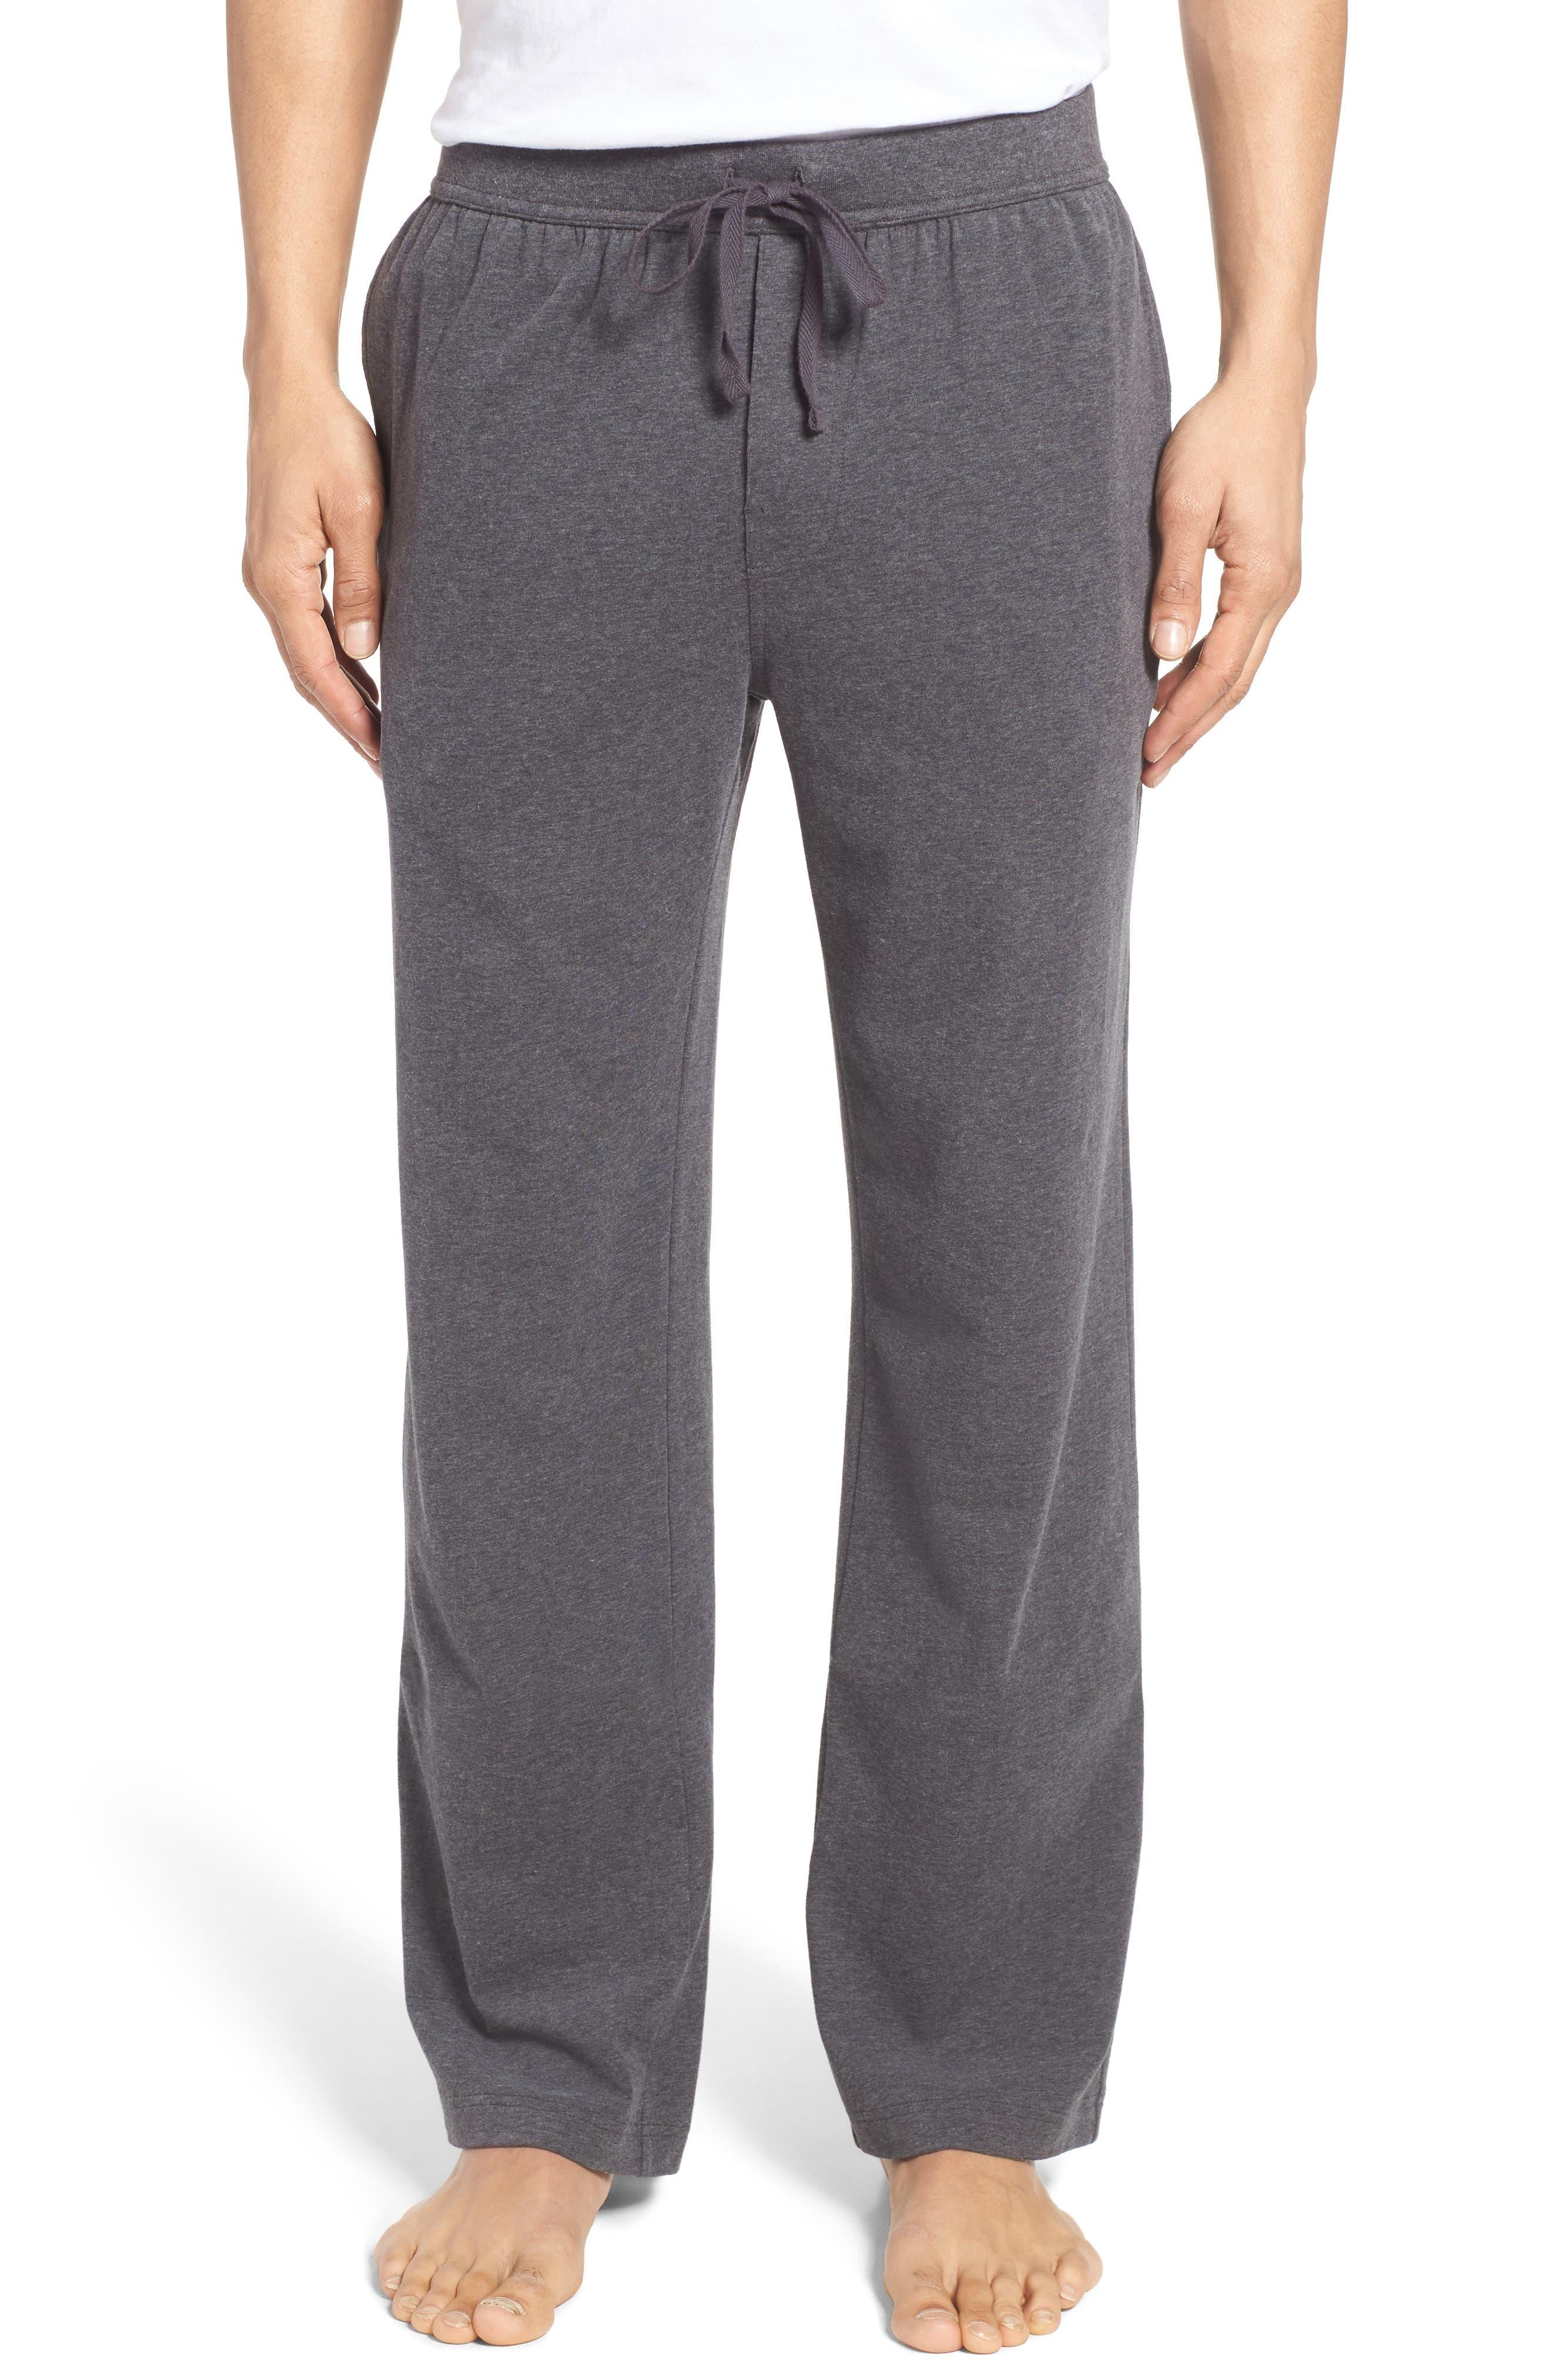 Stretch Cotton Lounge Pants,                         Main,                         color, Grey Charcoal